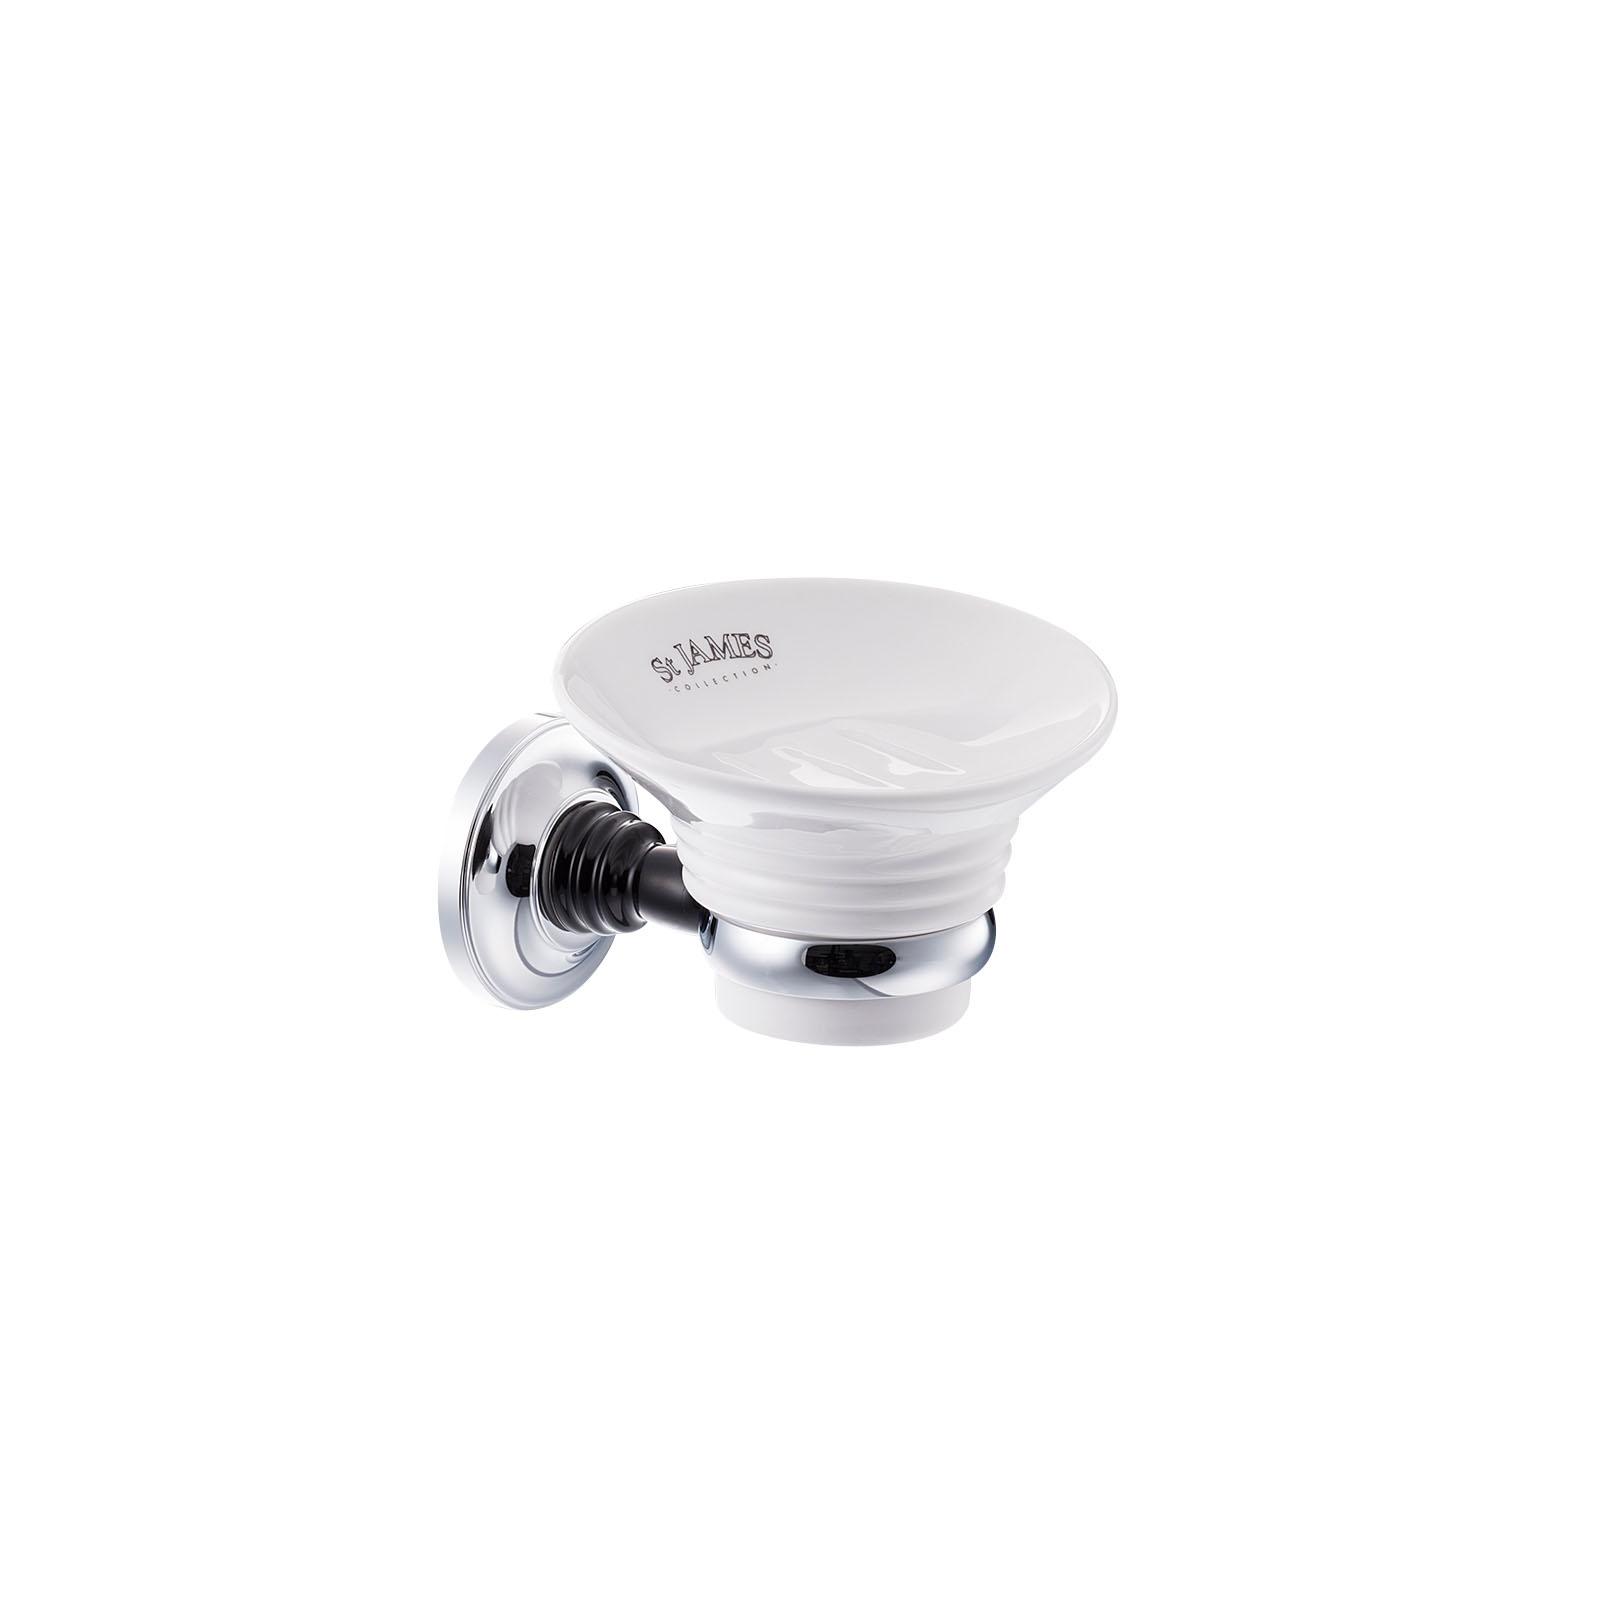 Picture of Porcelain Soap Dish & Holder